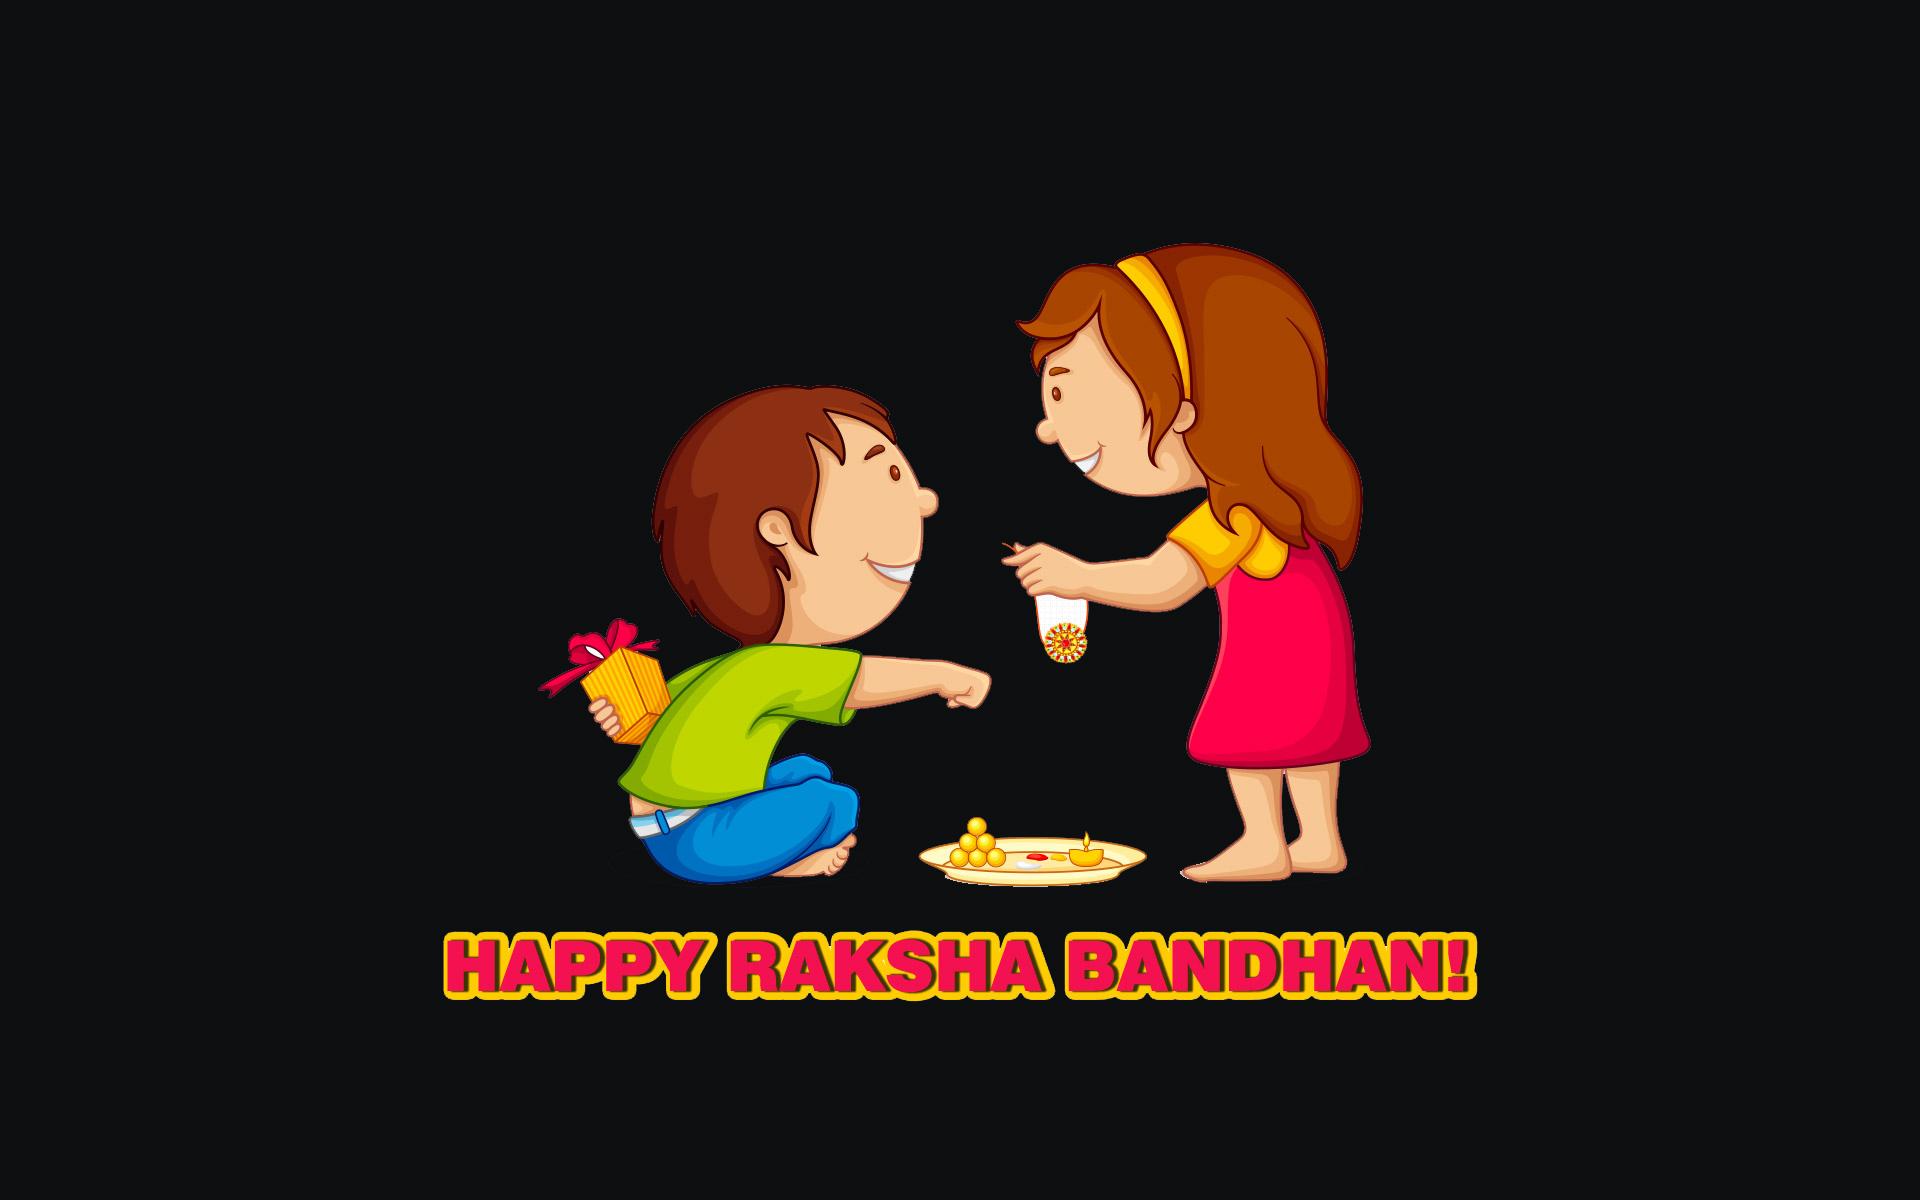 public://images/exec-life-images/2015/08/28/Raksha-Bandhan lead.jpg